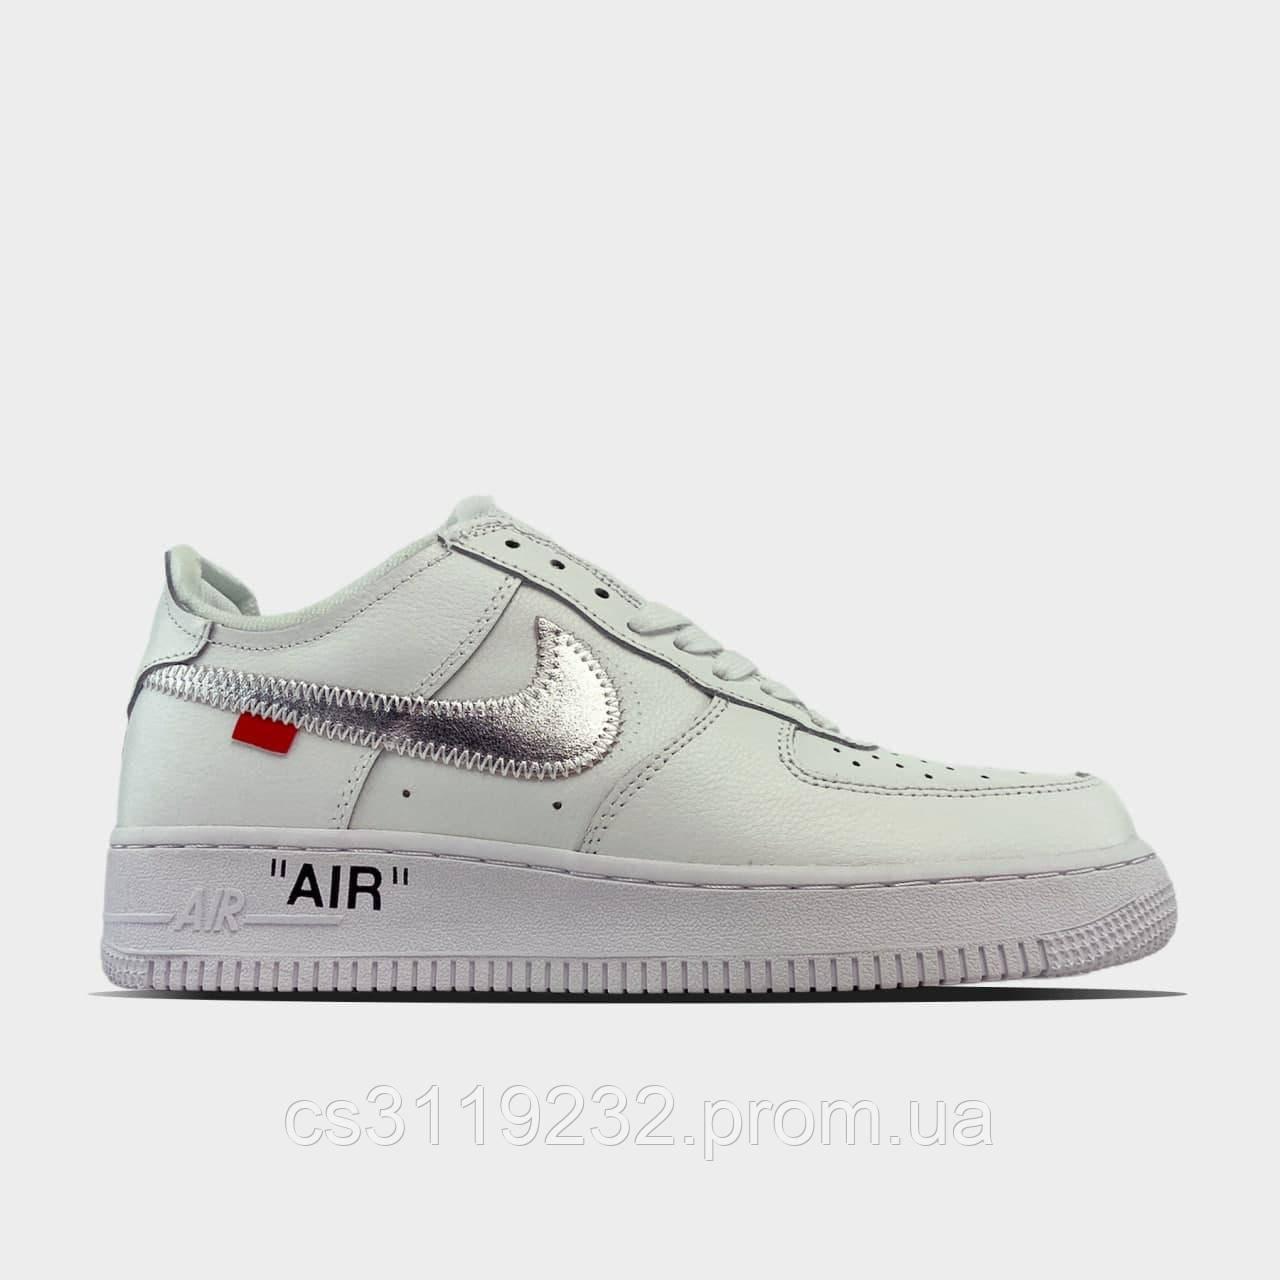 Женские кроссовки Nike Air Force 1 '07 Low SE Premium White Black (белые)